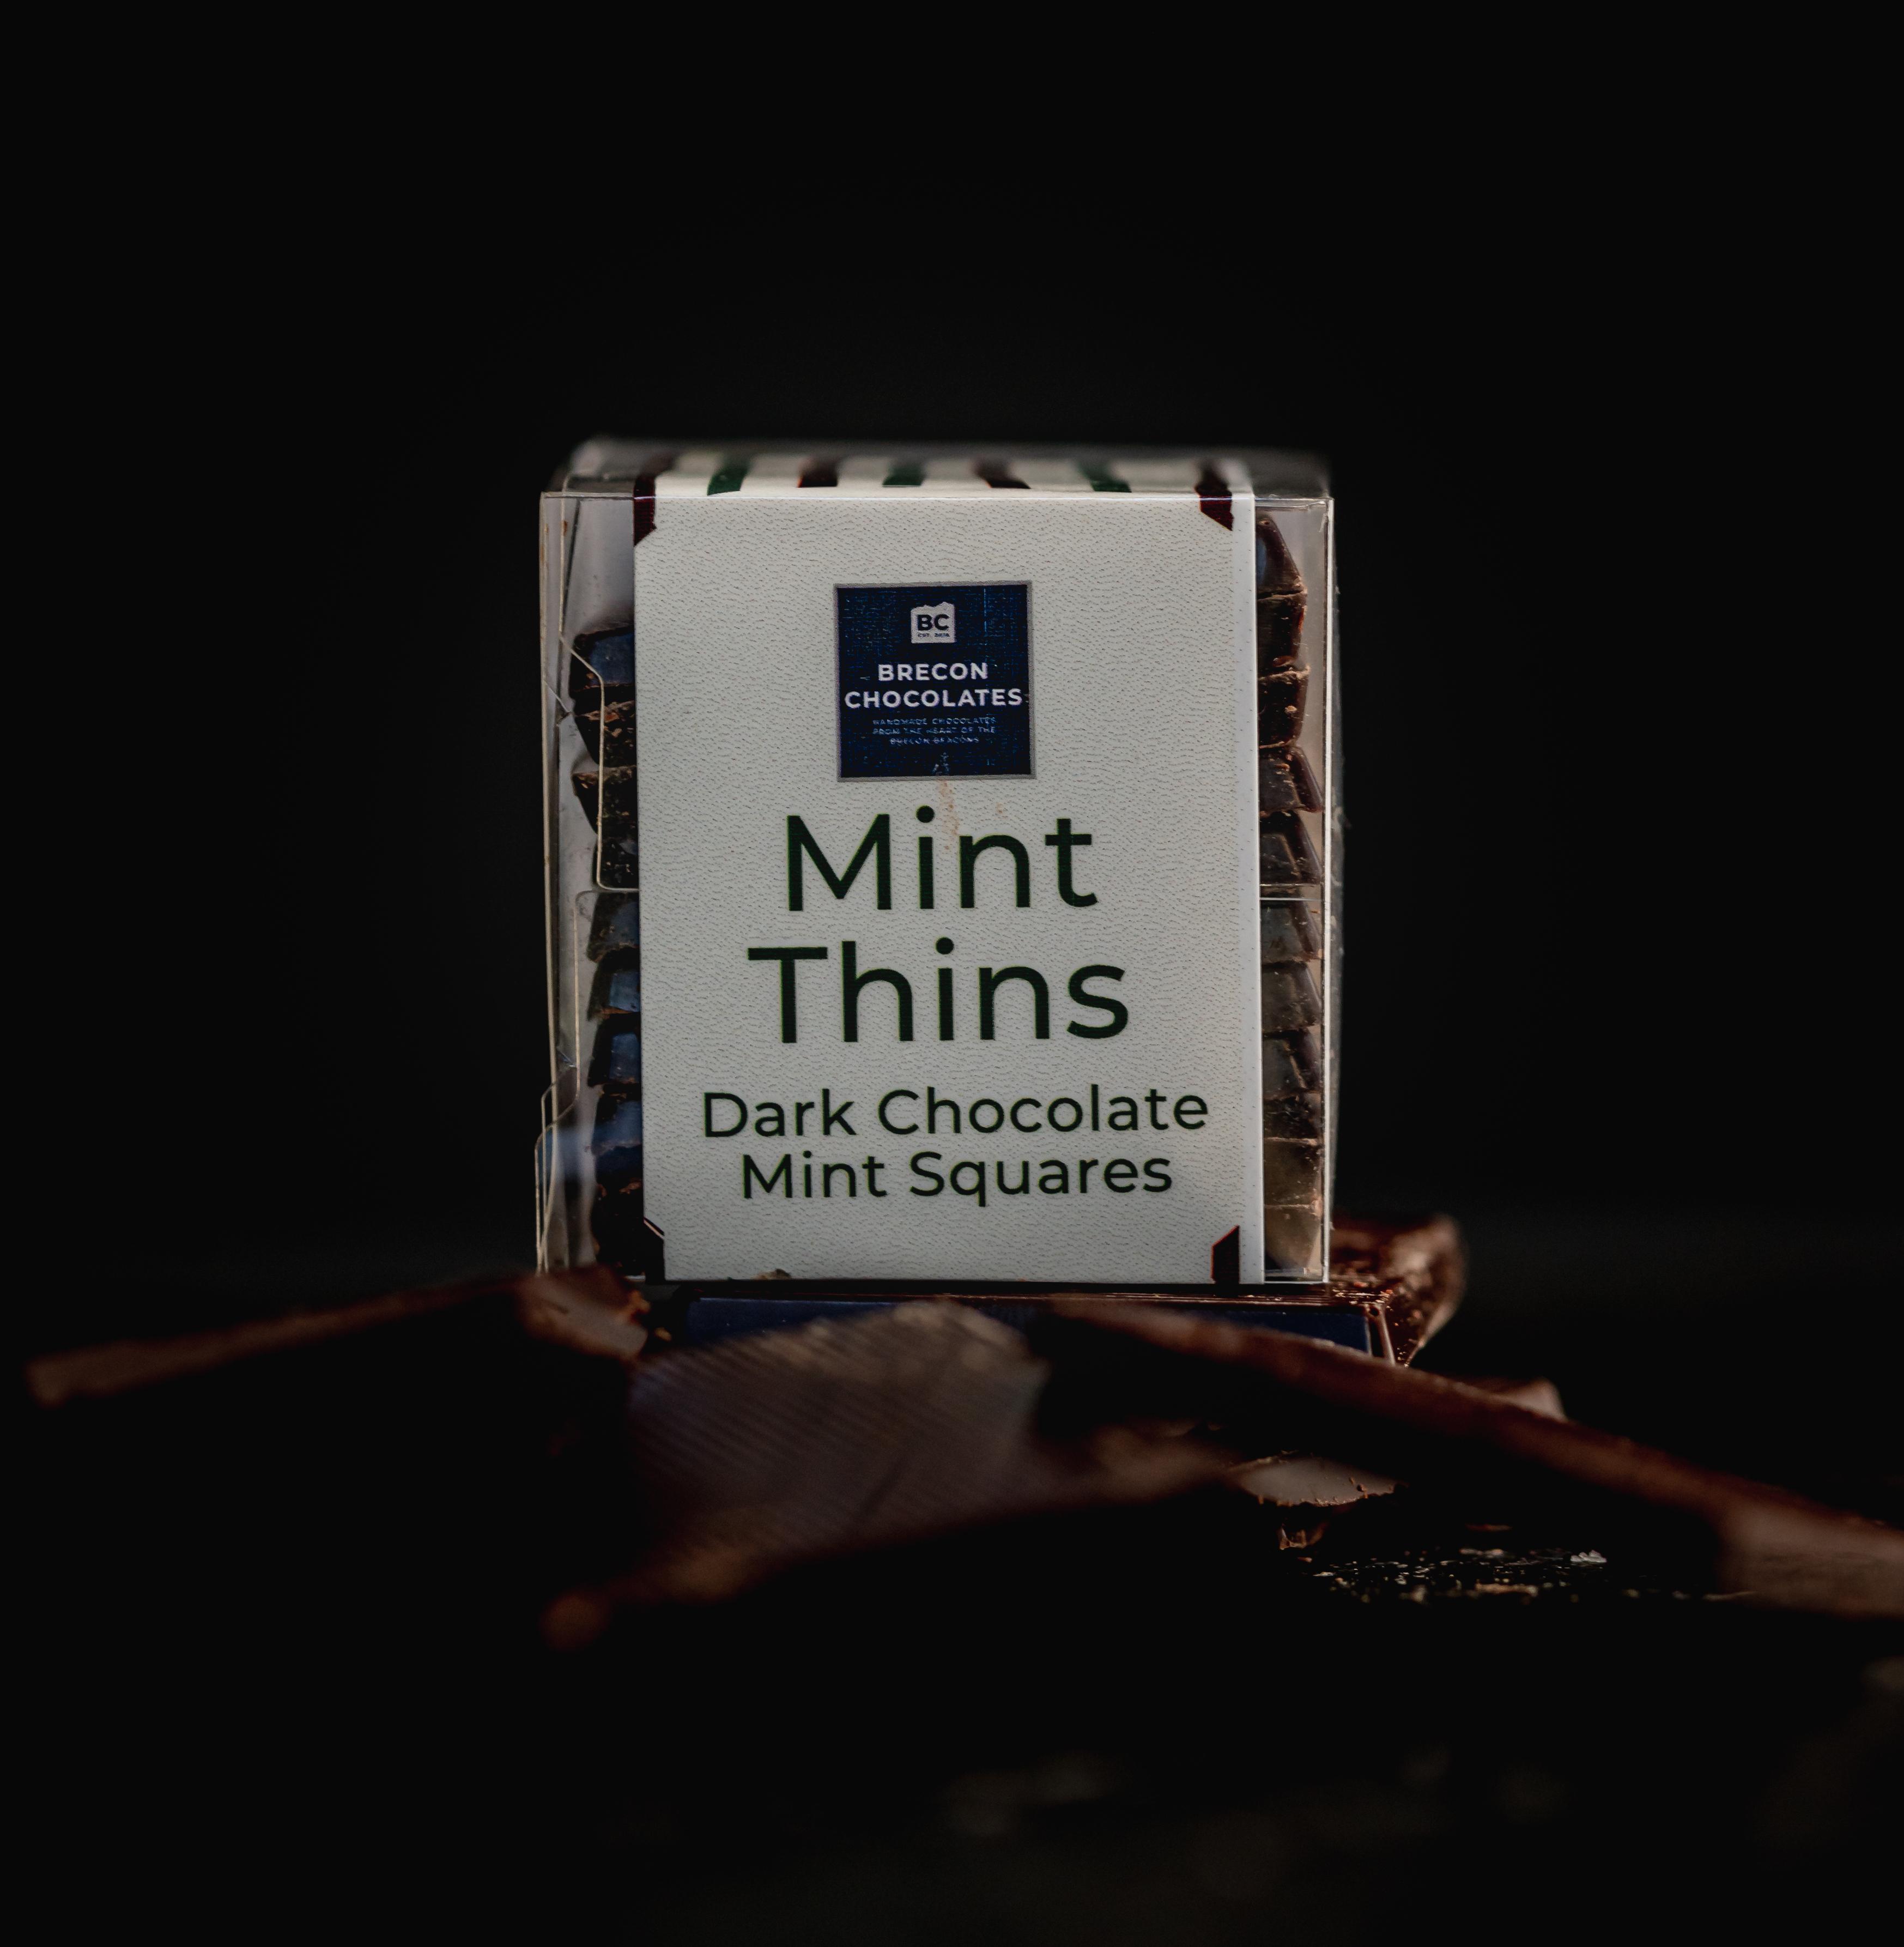 10 Dark Chocolate Mint Thins